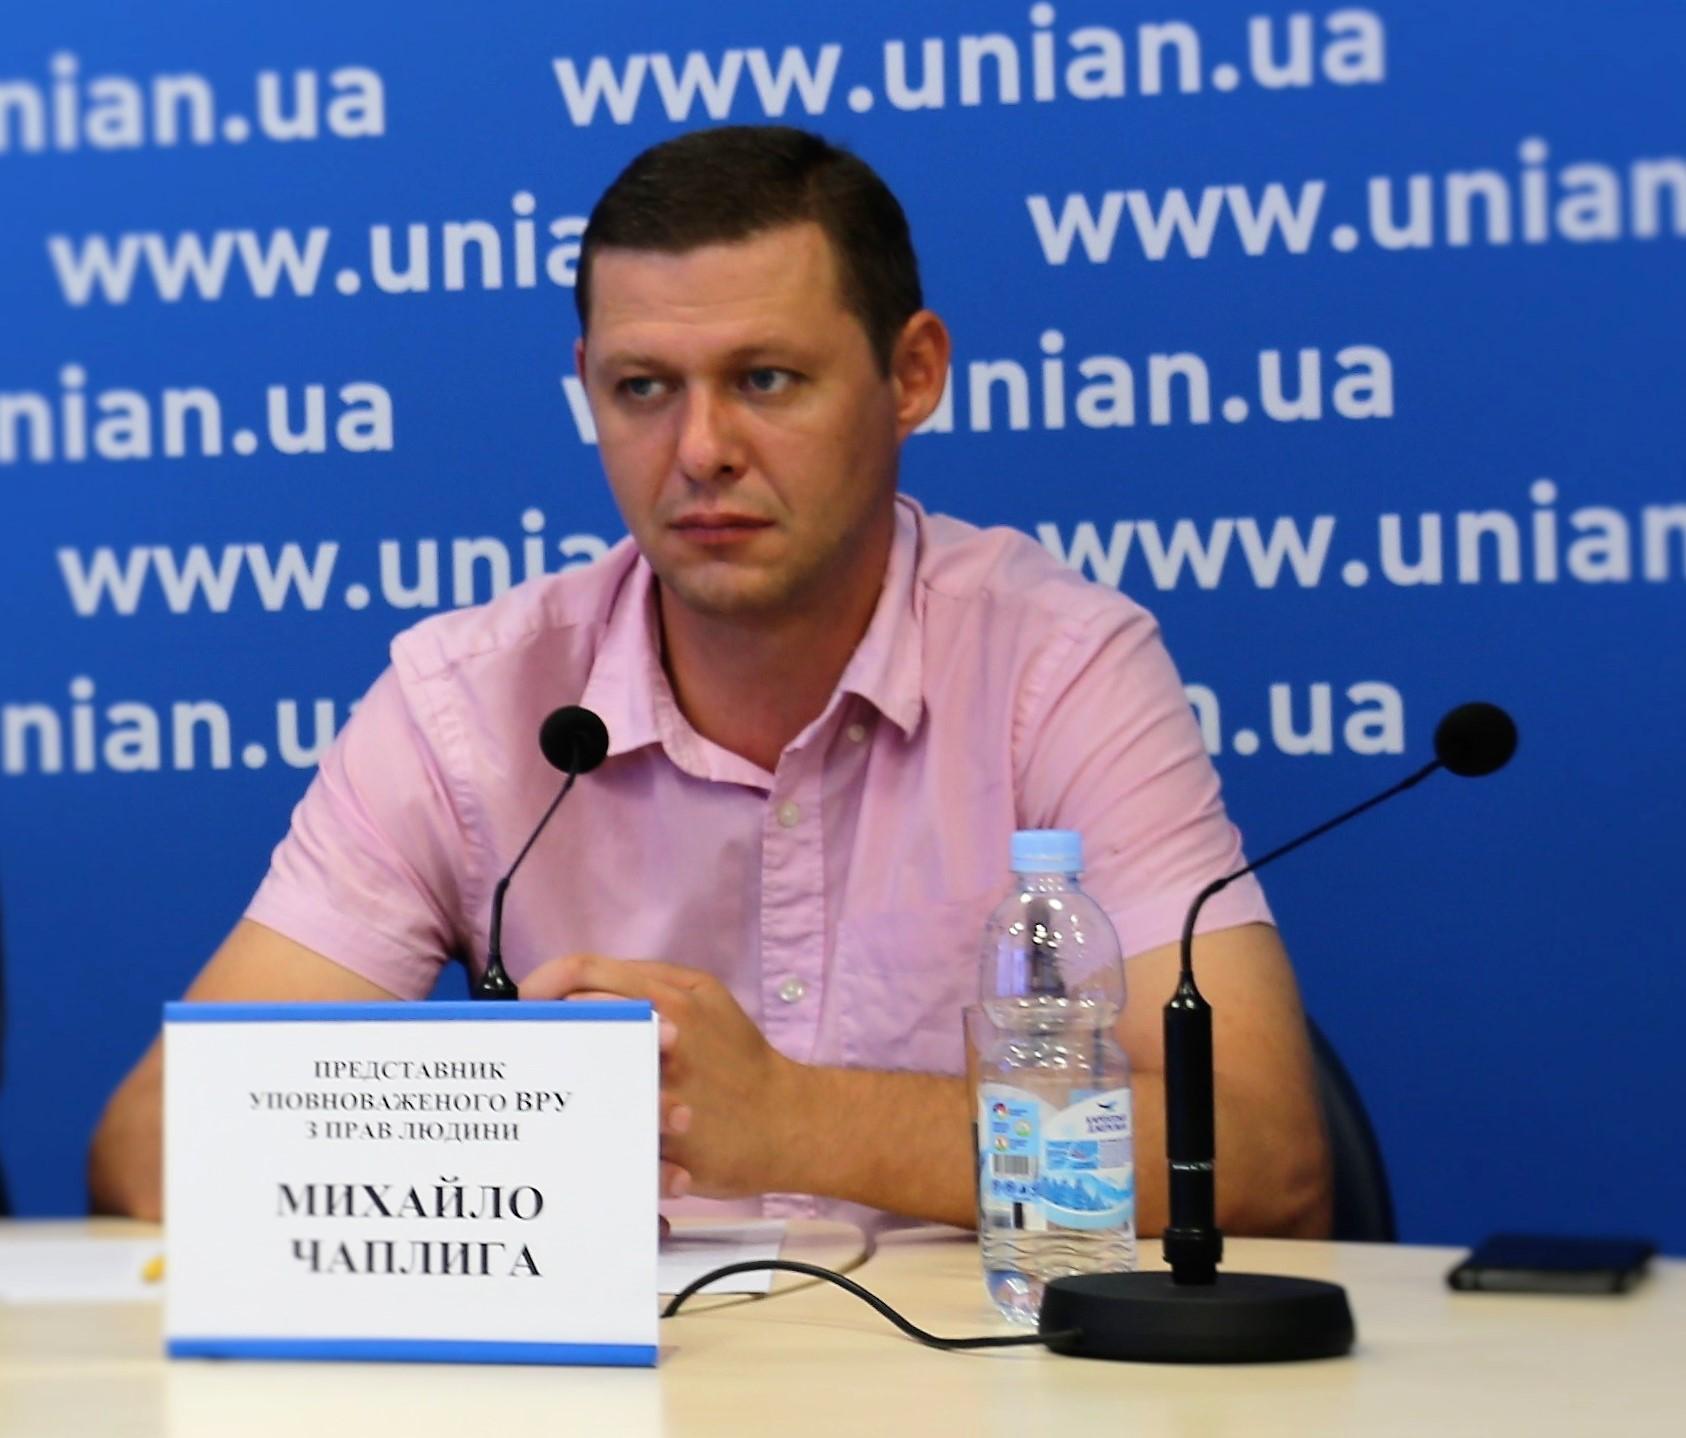 Михаил Чаплига